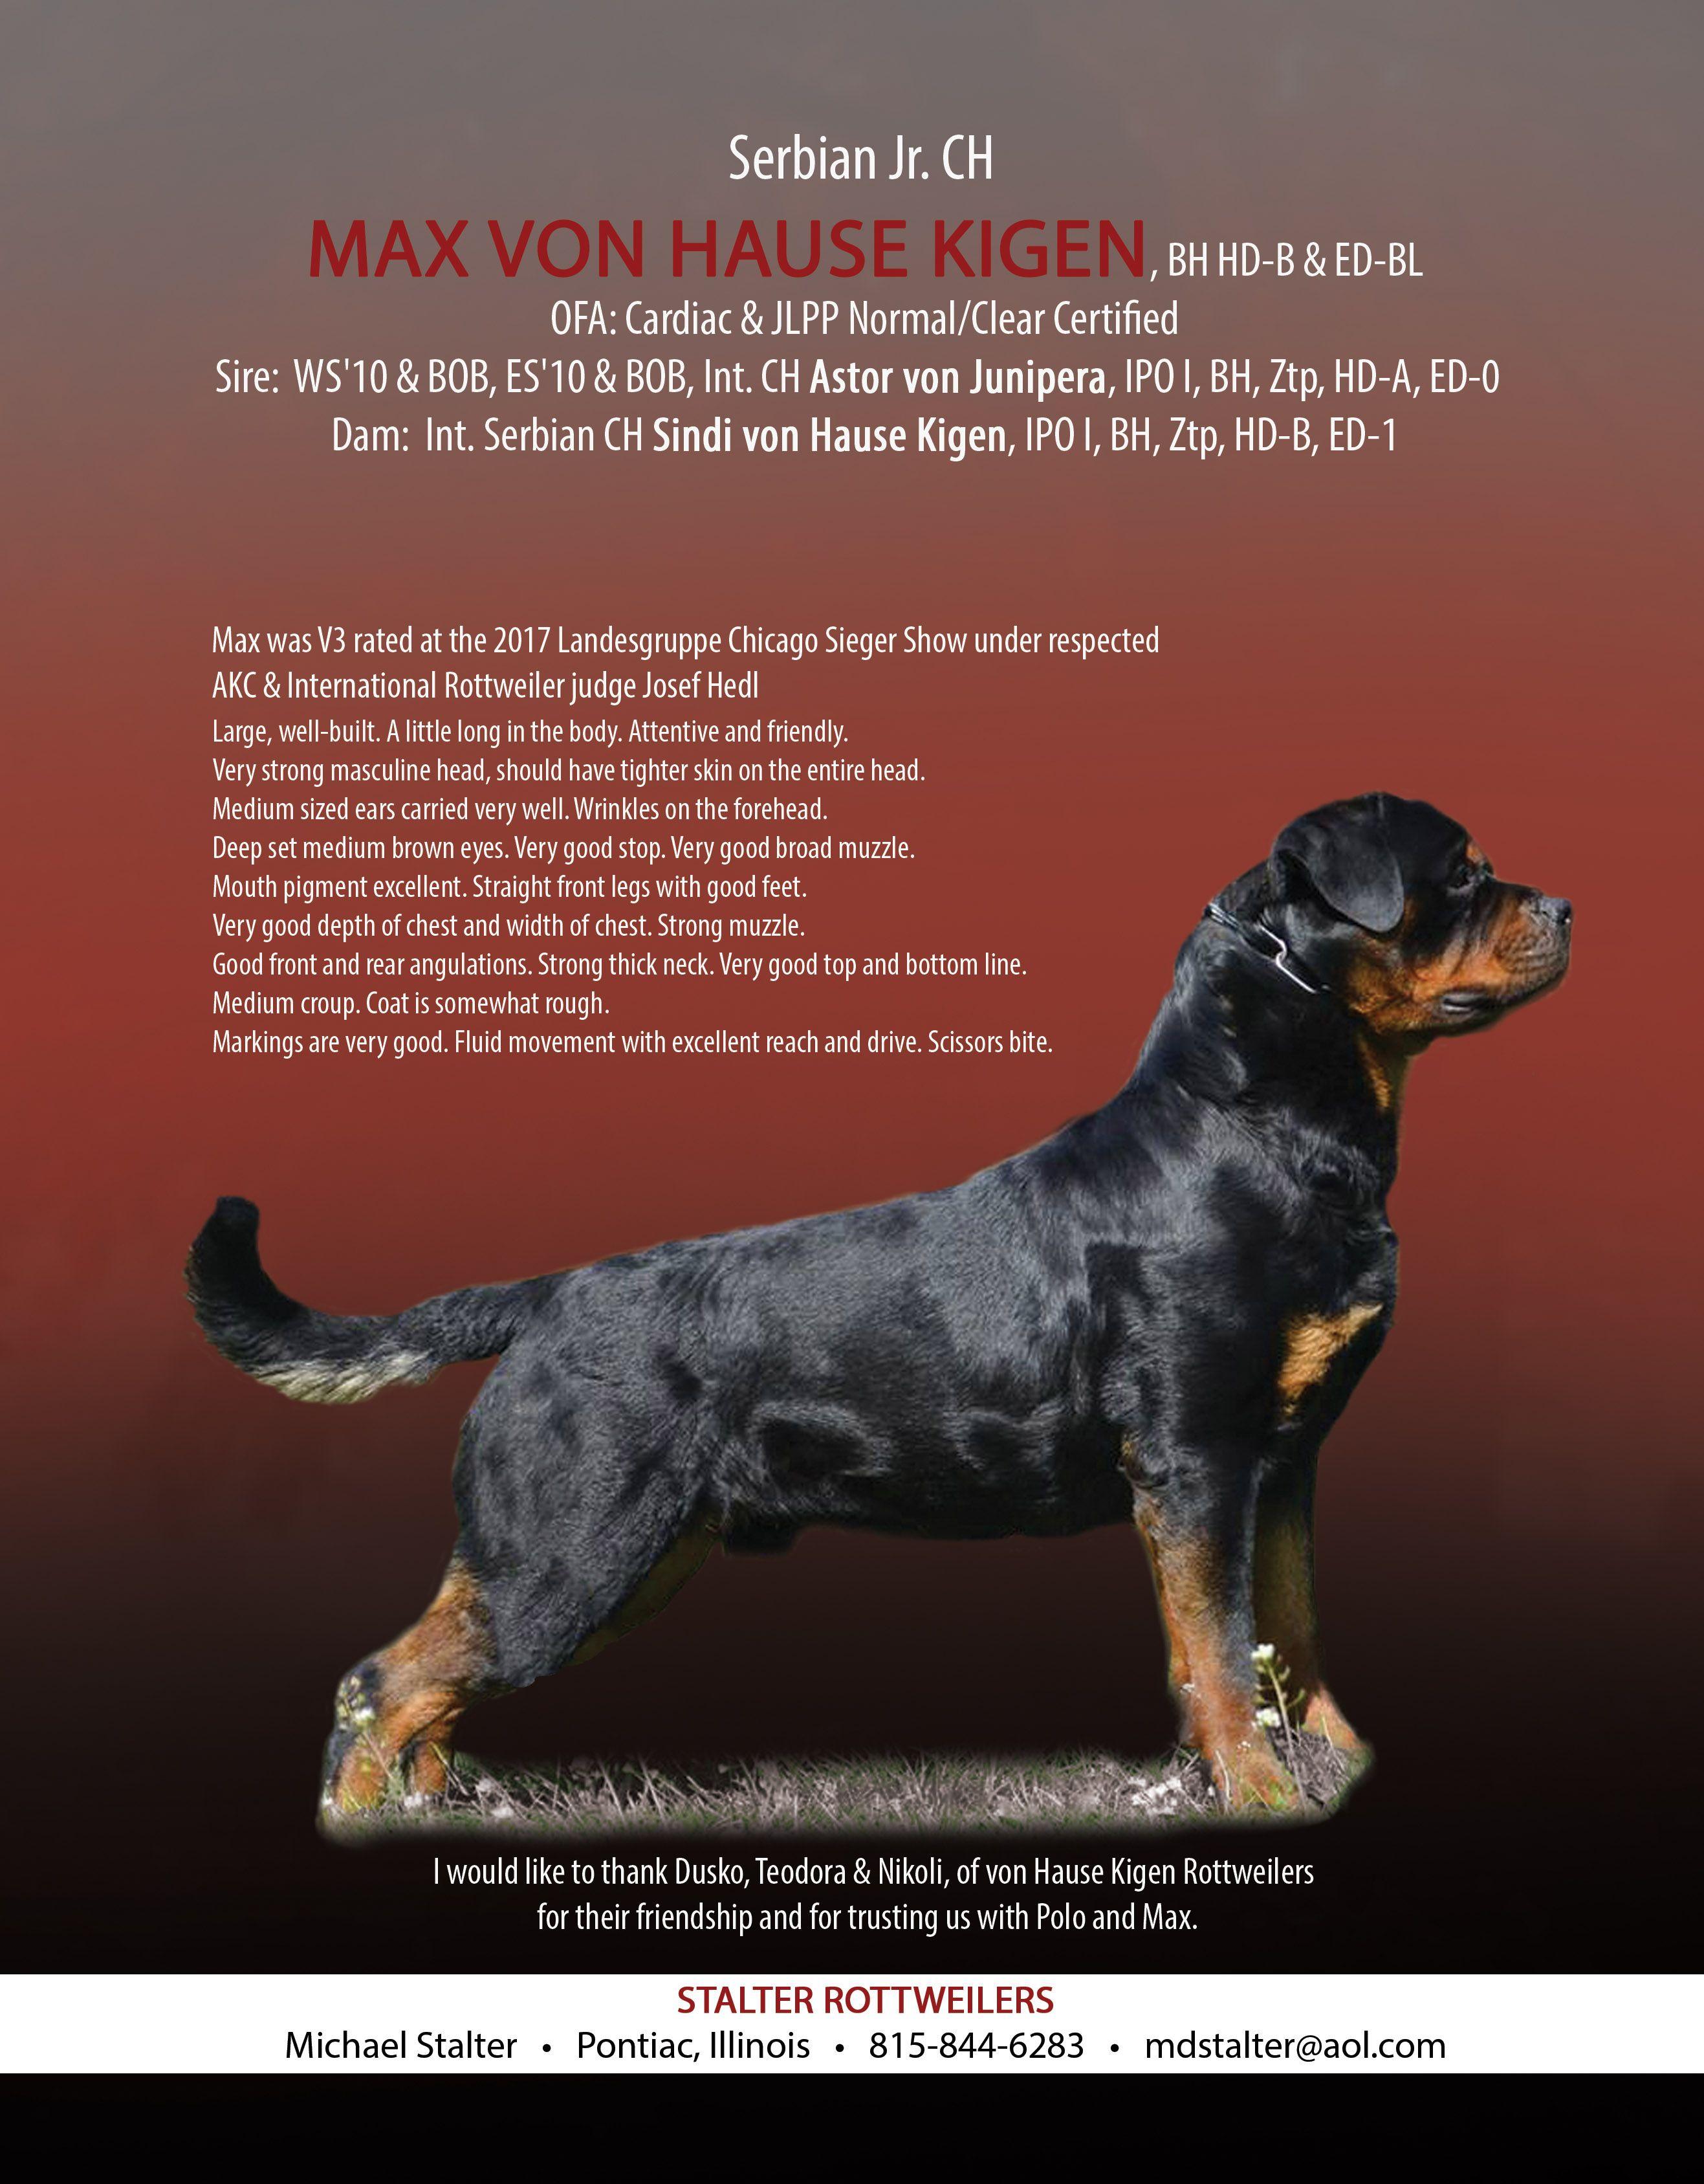 Stalter Rottweilers Michael Stalter Pontiac, Illinois 815